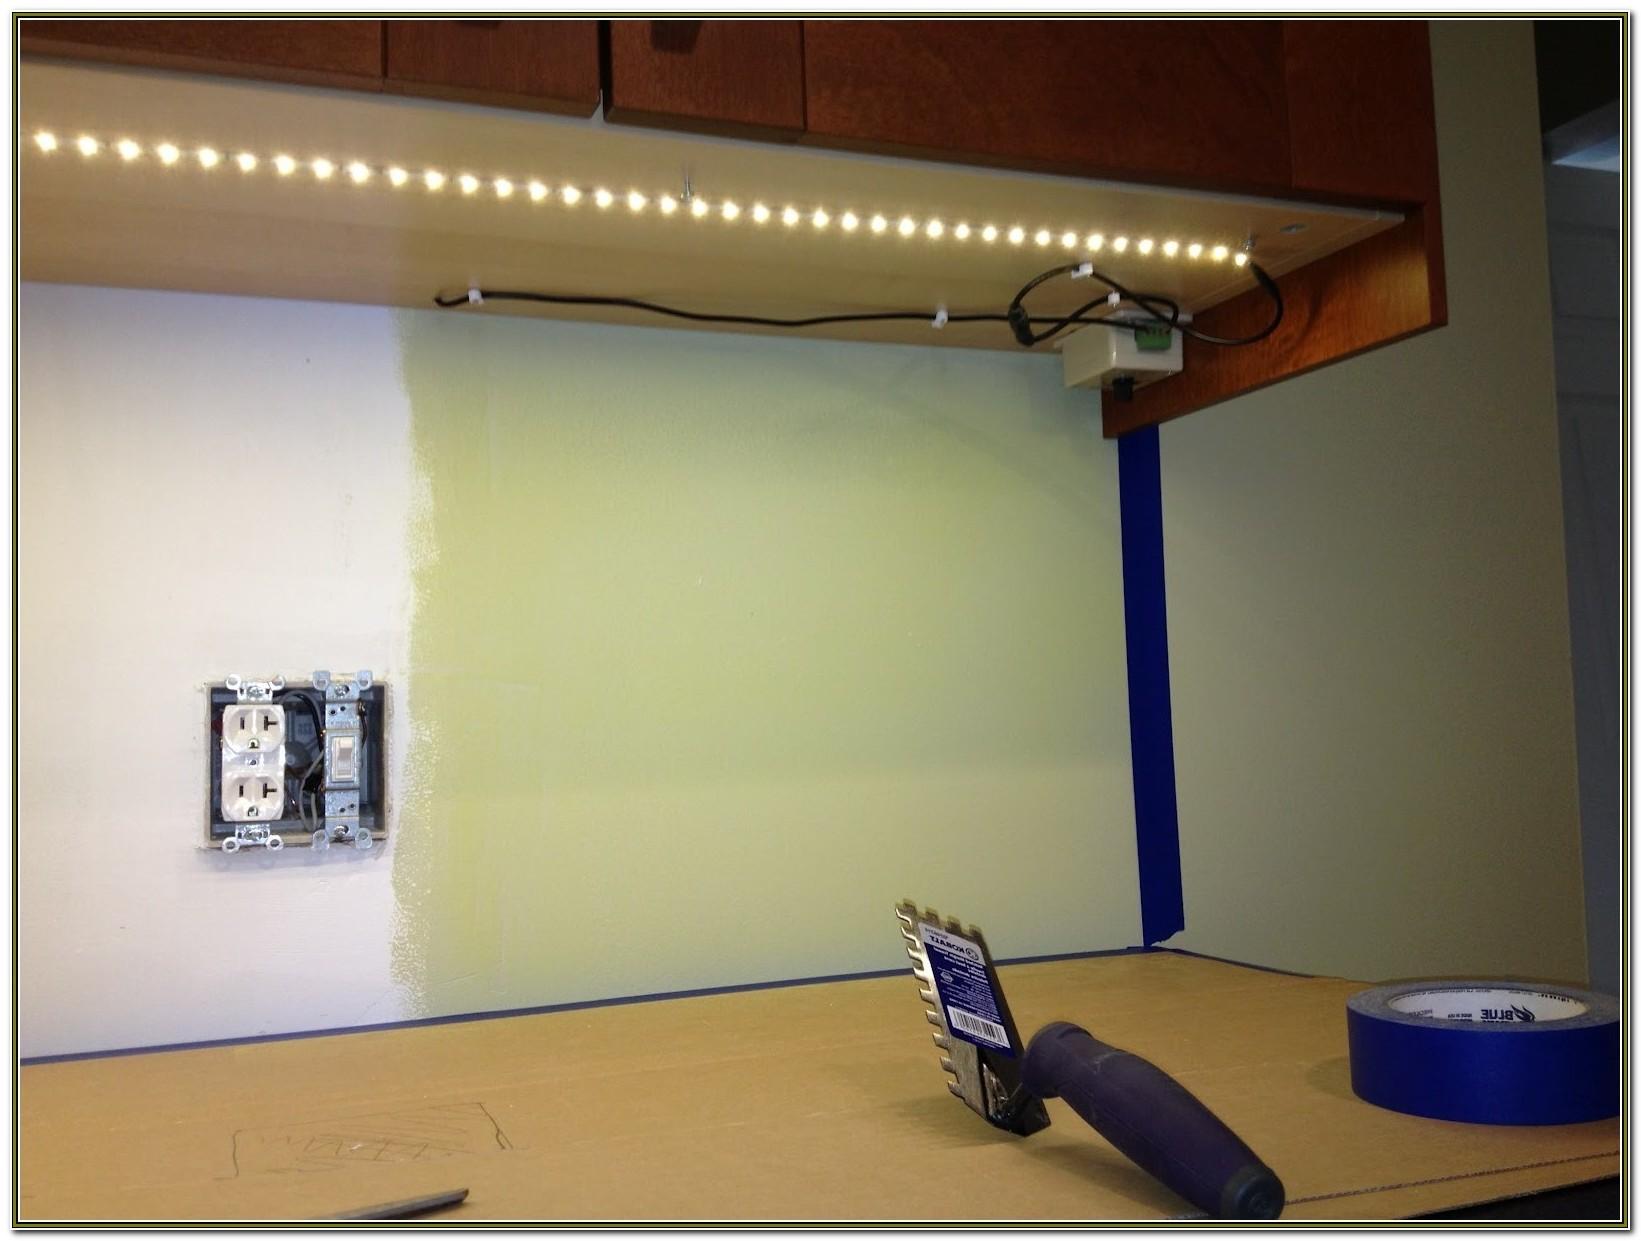 Hardwired Under Cabinet Lighting Transformer